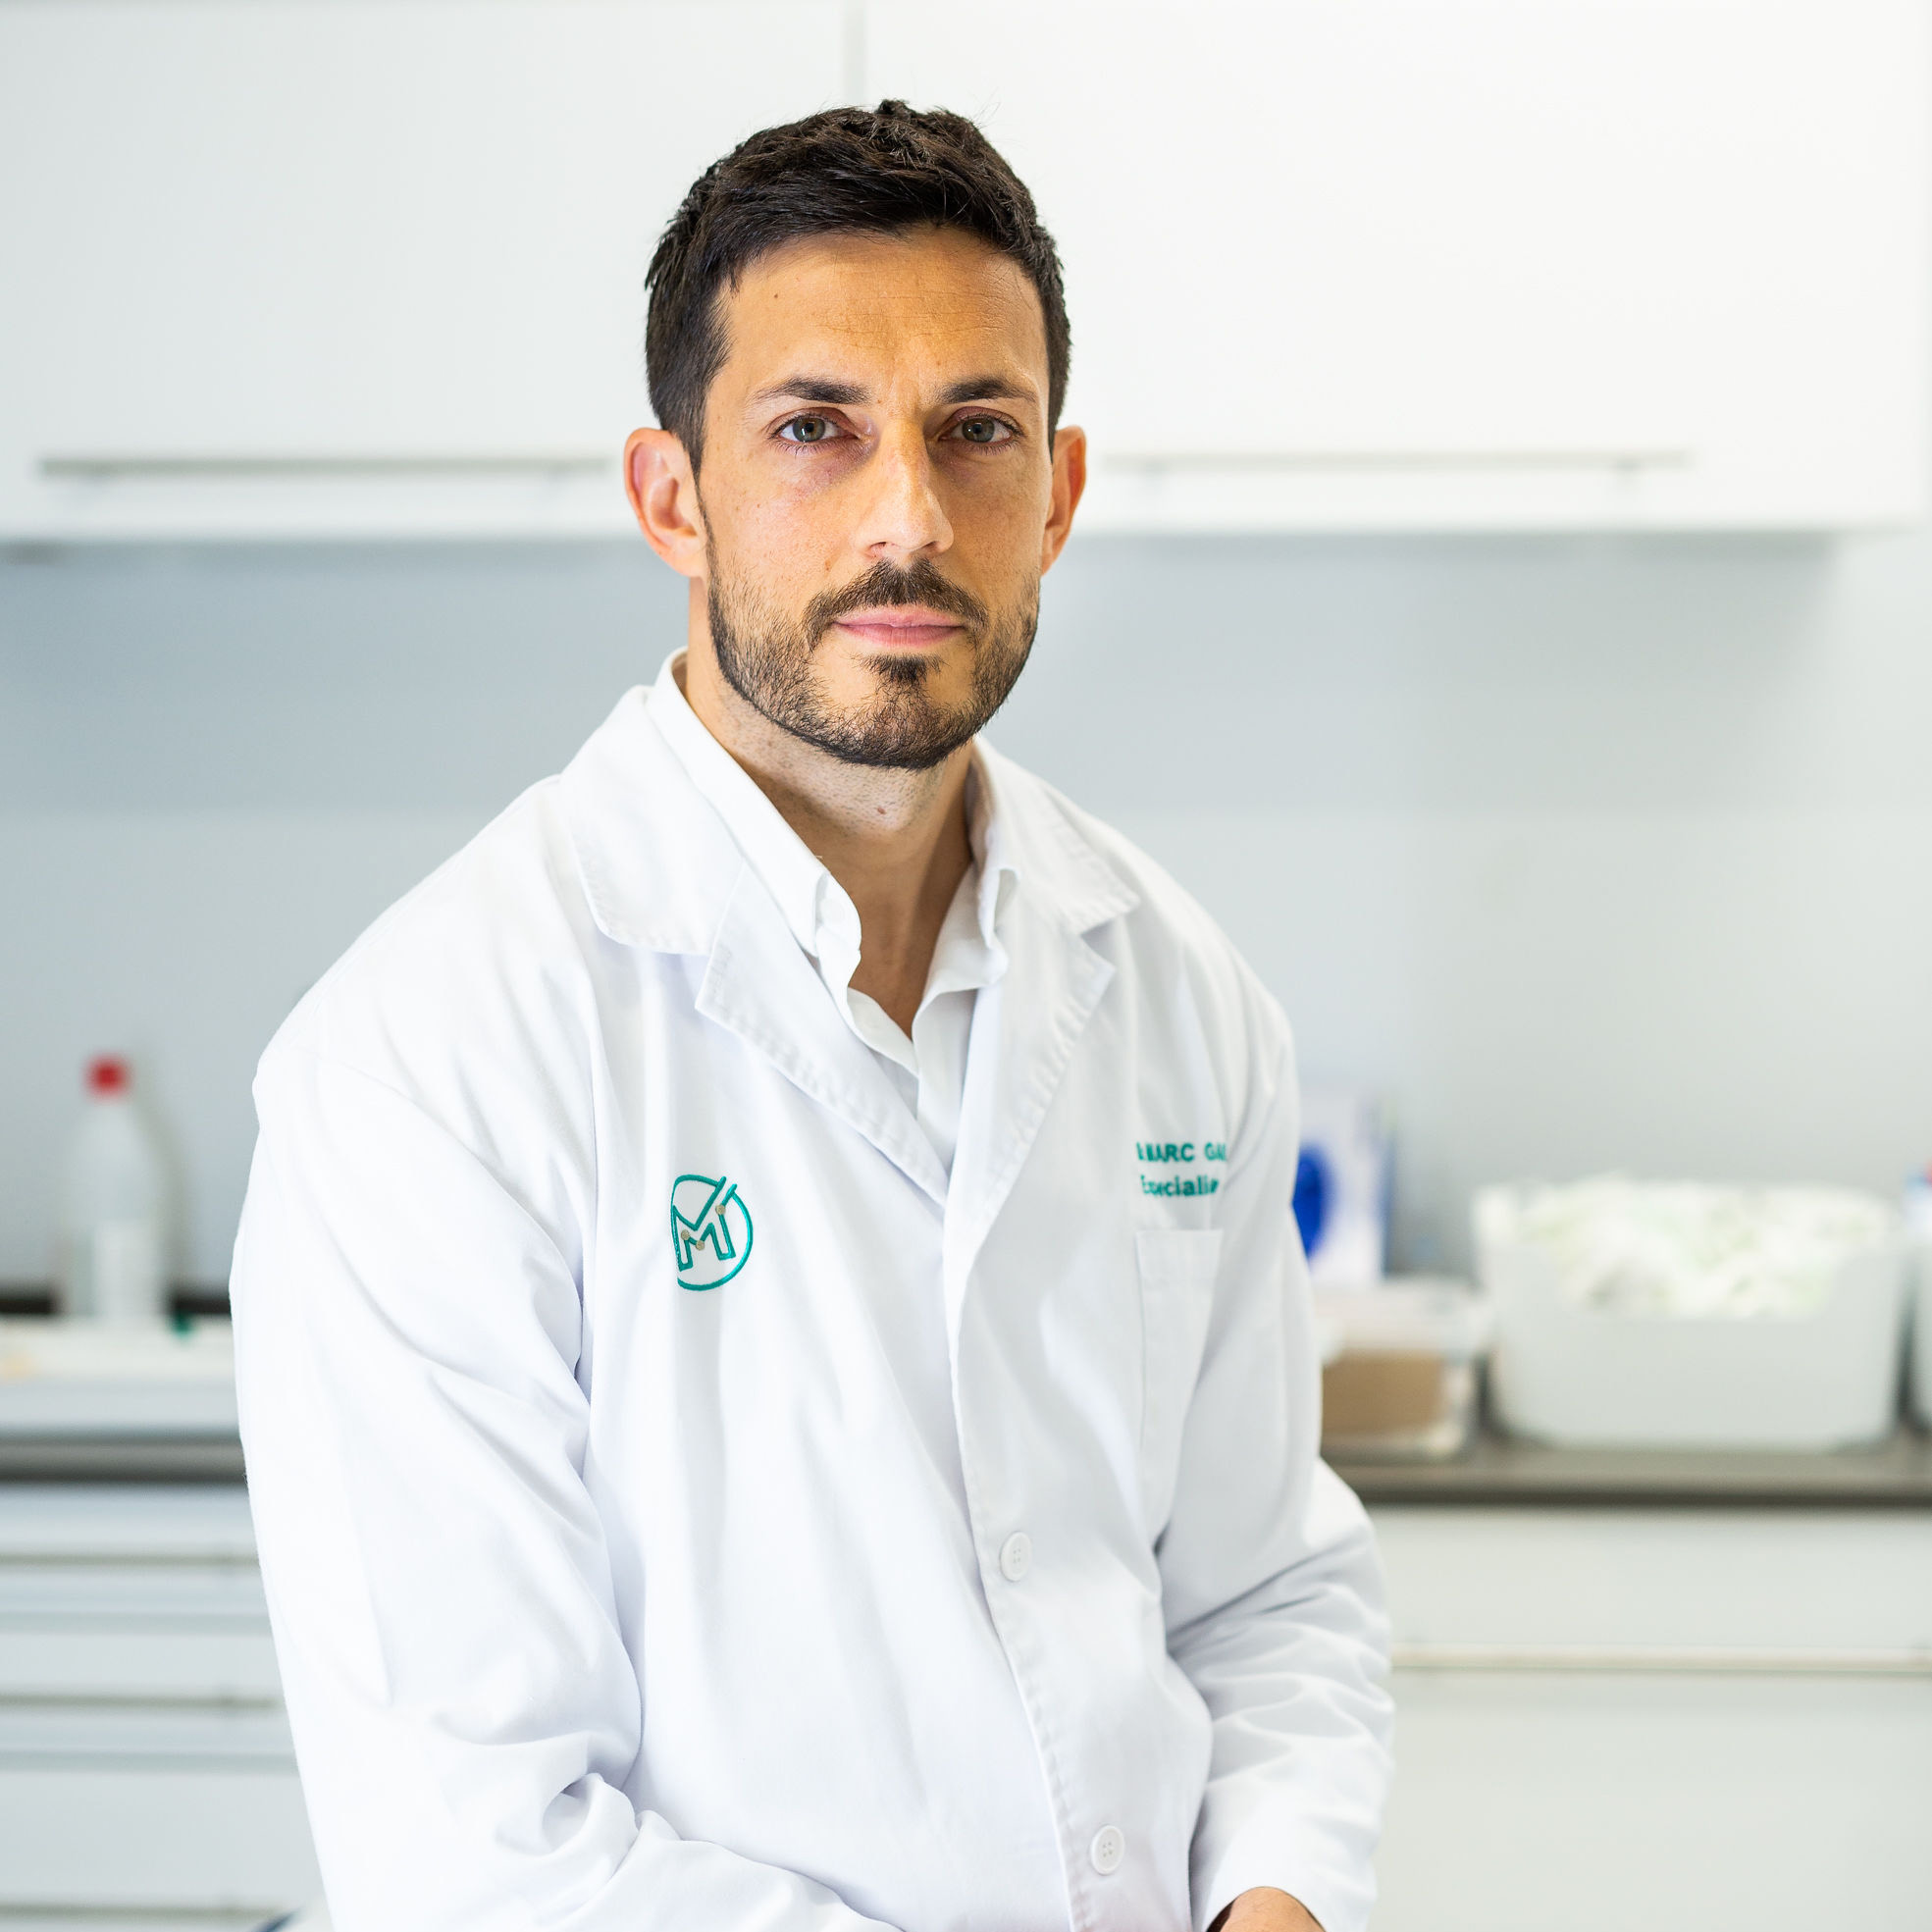 Dr. Garriga